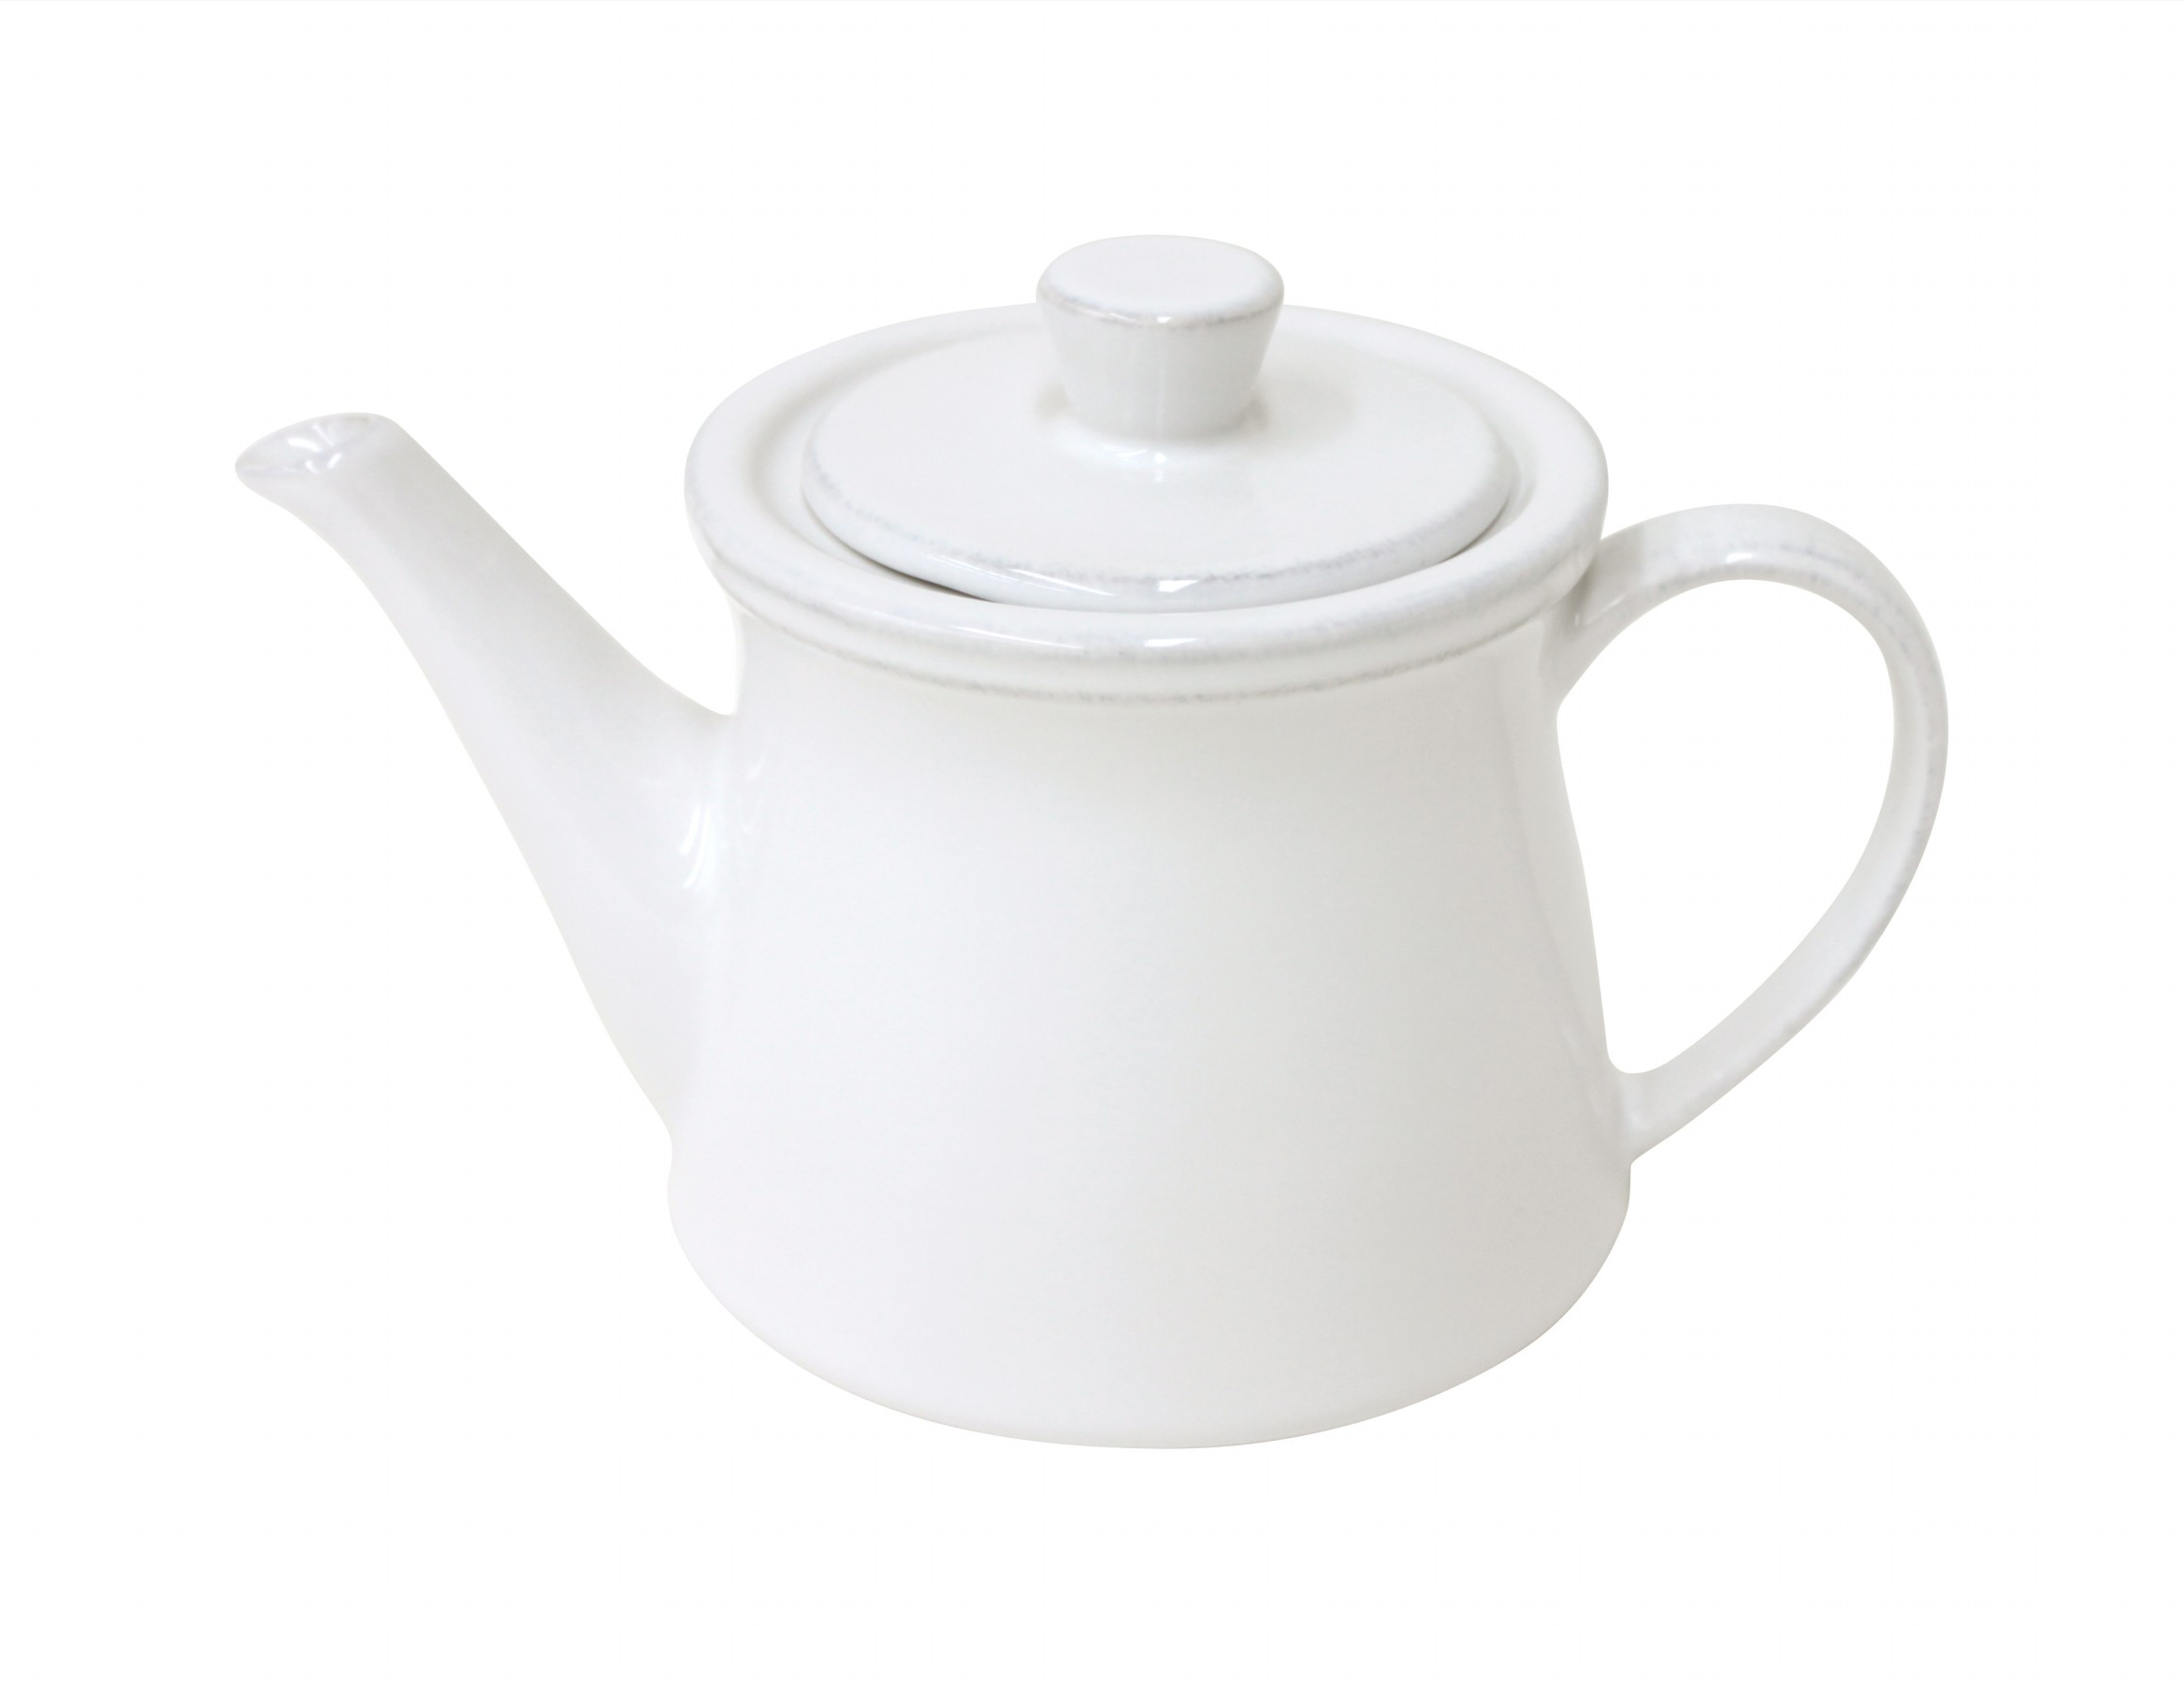 COSTA NOVA Konvice na čaj Friso 0,5 l